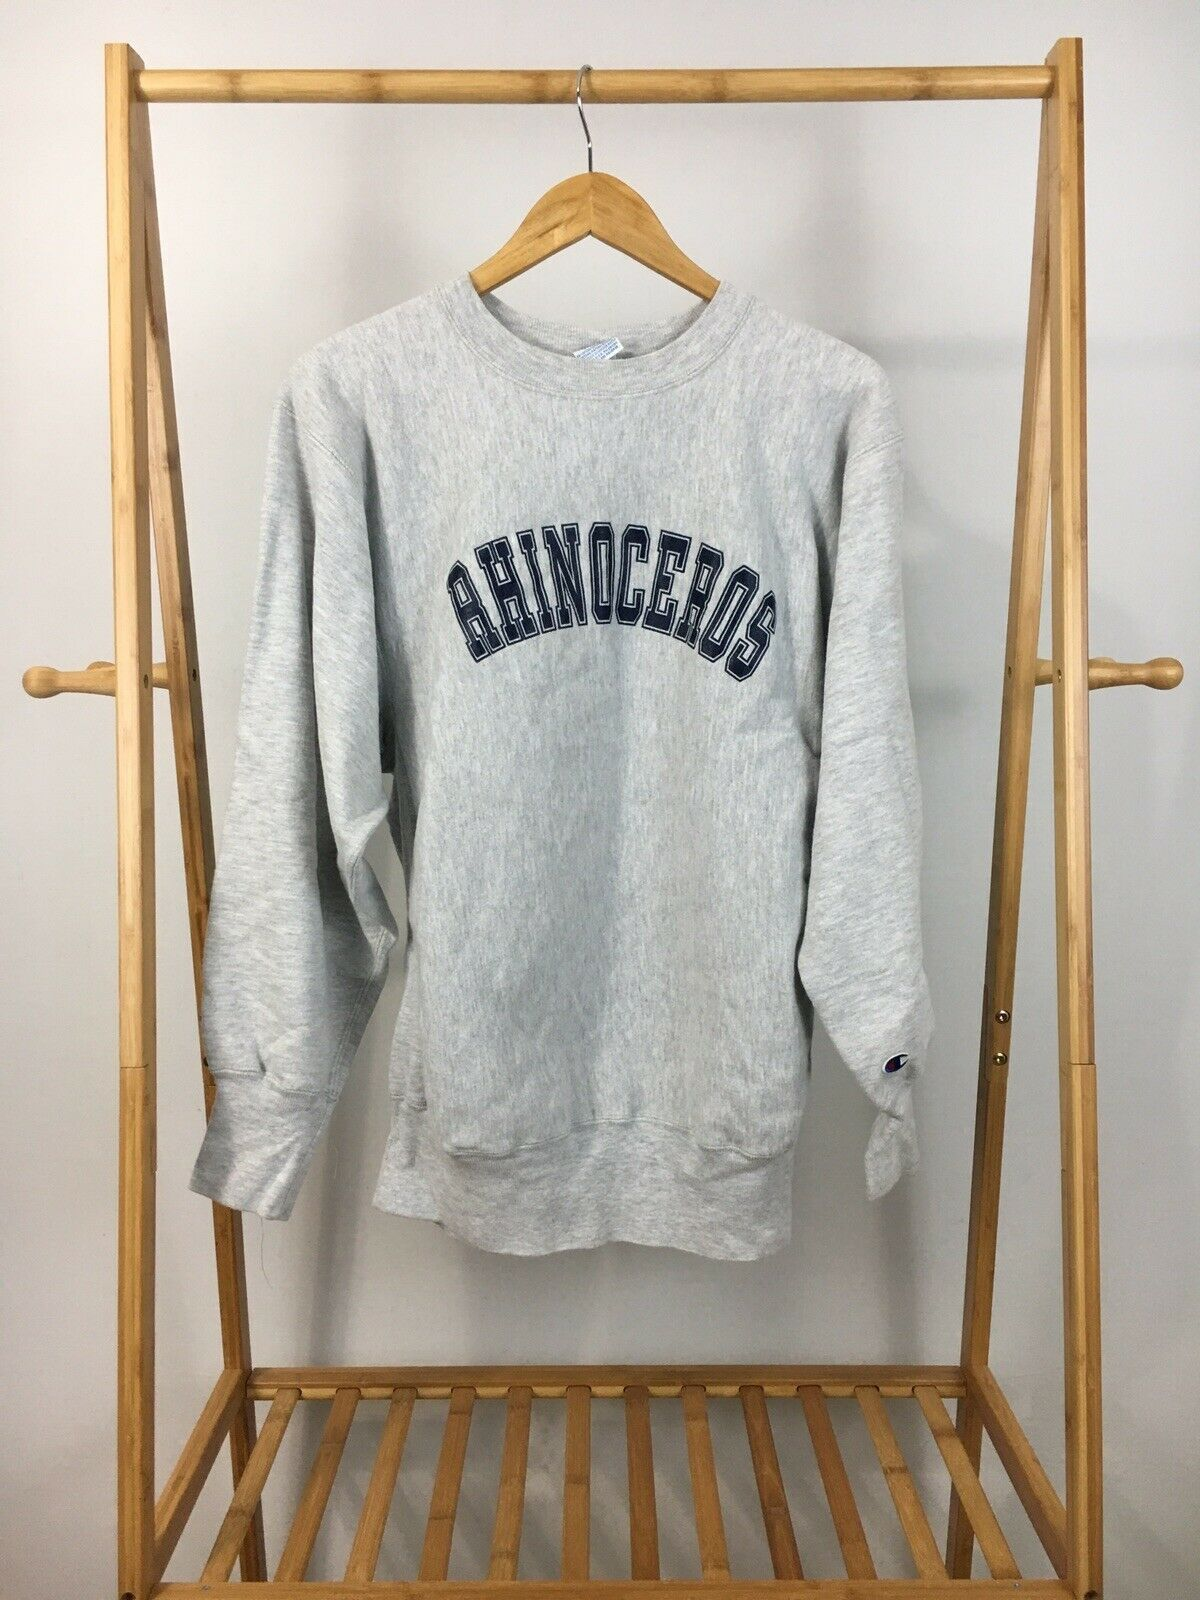 RARE VTG Champion Reverse Weave Rhinoceros Crewneck Sweatshirt Size XL USA